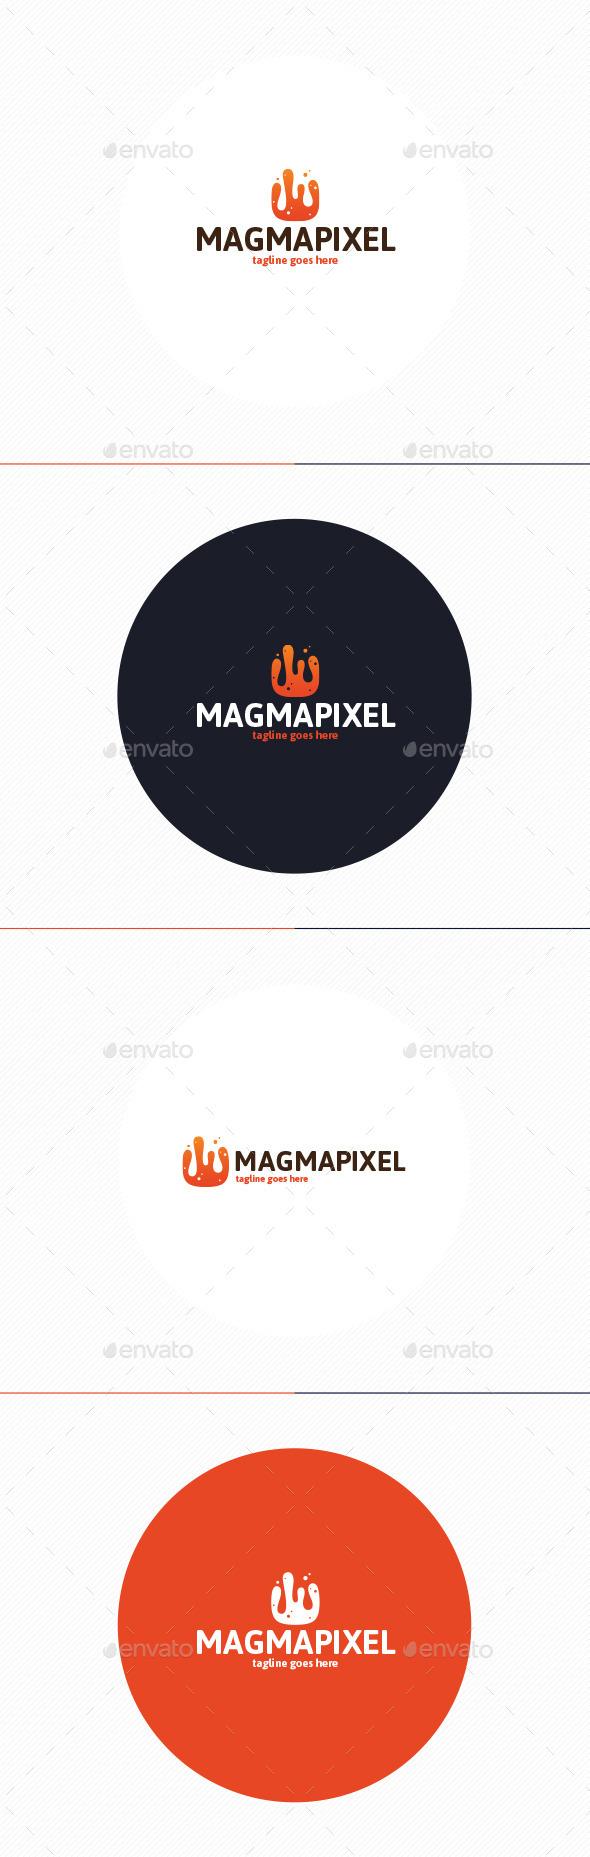 Magma Pixel Logo - Vector Abstract